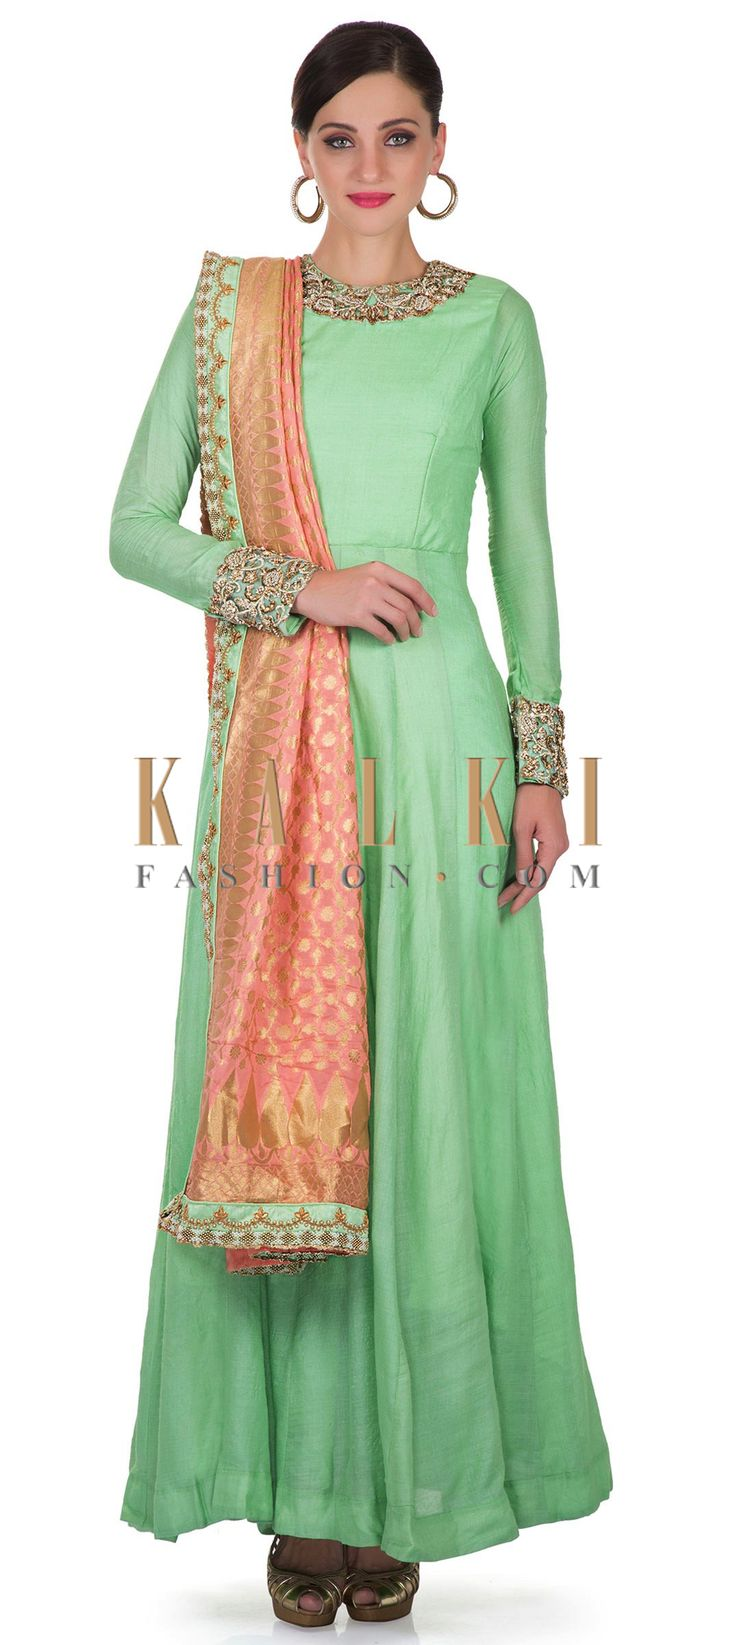 Sea Green Cotton Silk Anarkali Top Featuring Zardosi Work and Peach Brocade Silk Dupatta only on Kalki